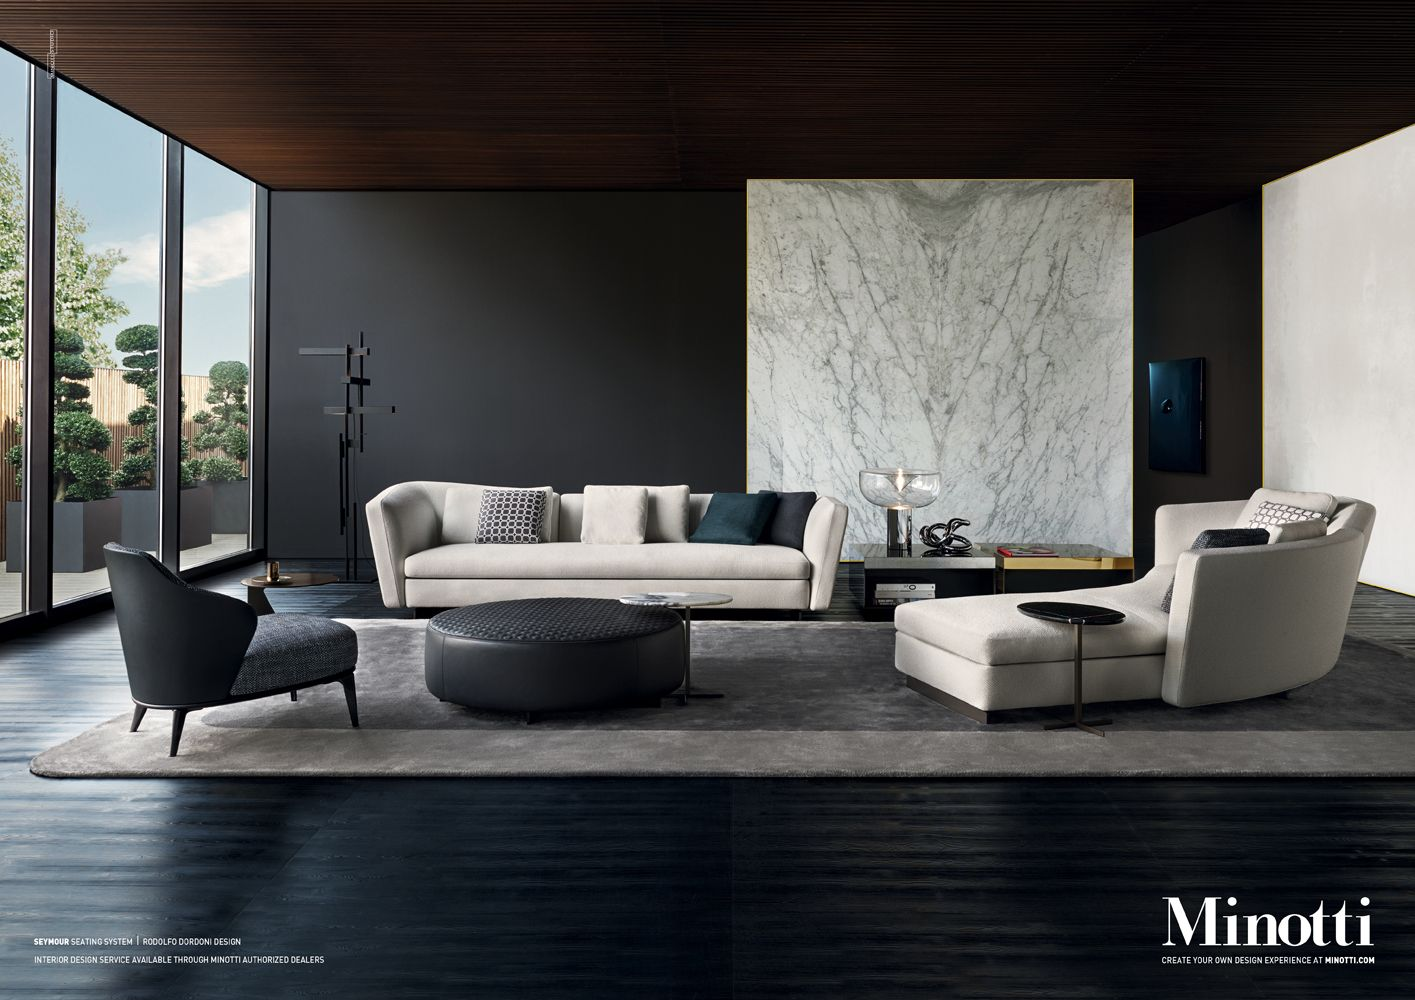 Seymour seating system rodolfo dordoni design adv seymour sofa living room haus - Raumausstattung wohnzimmer ...